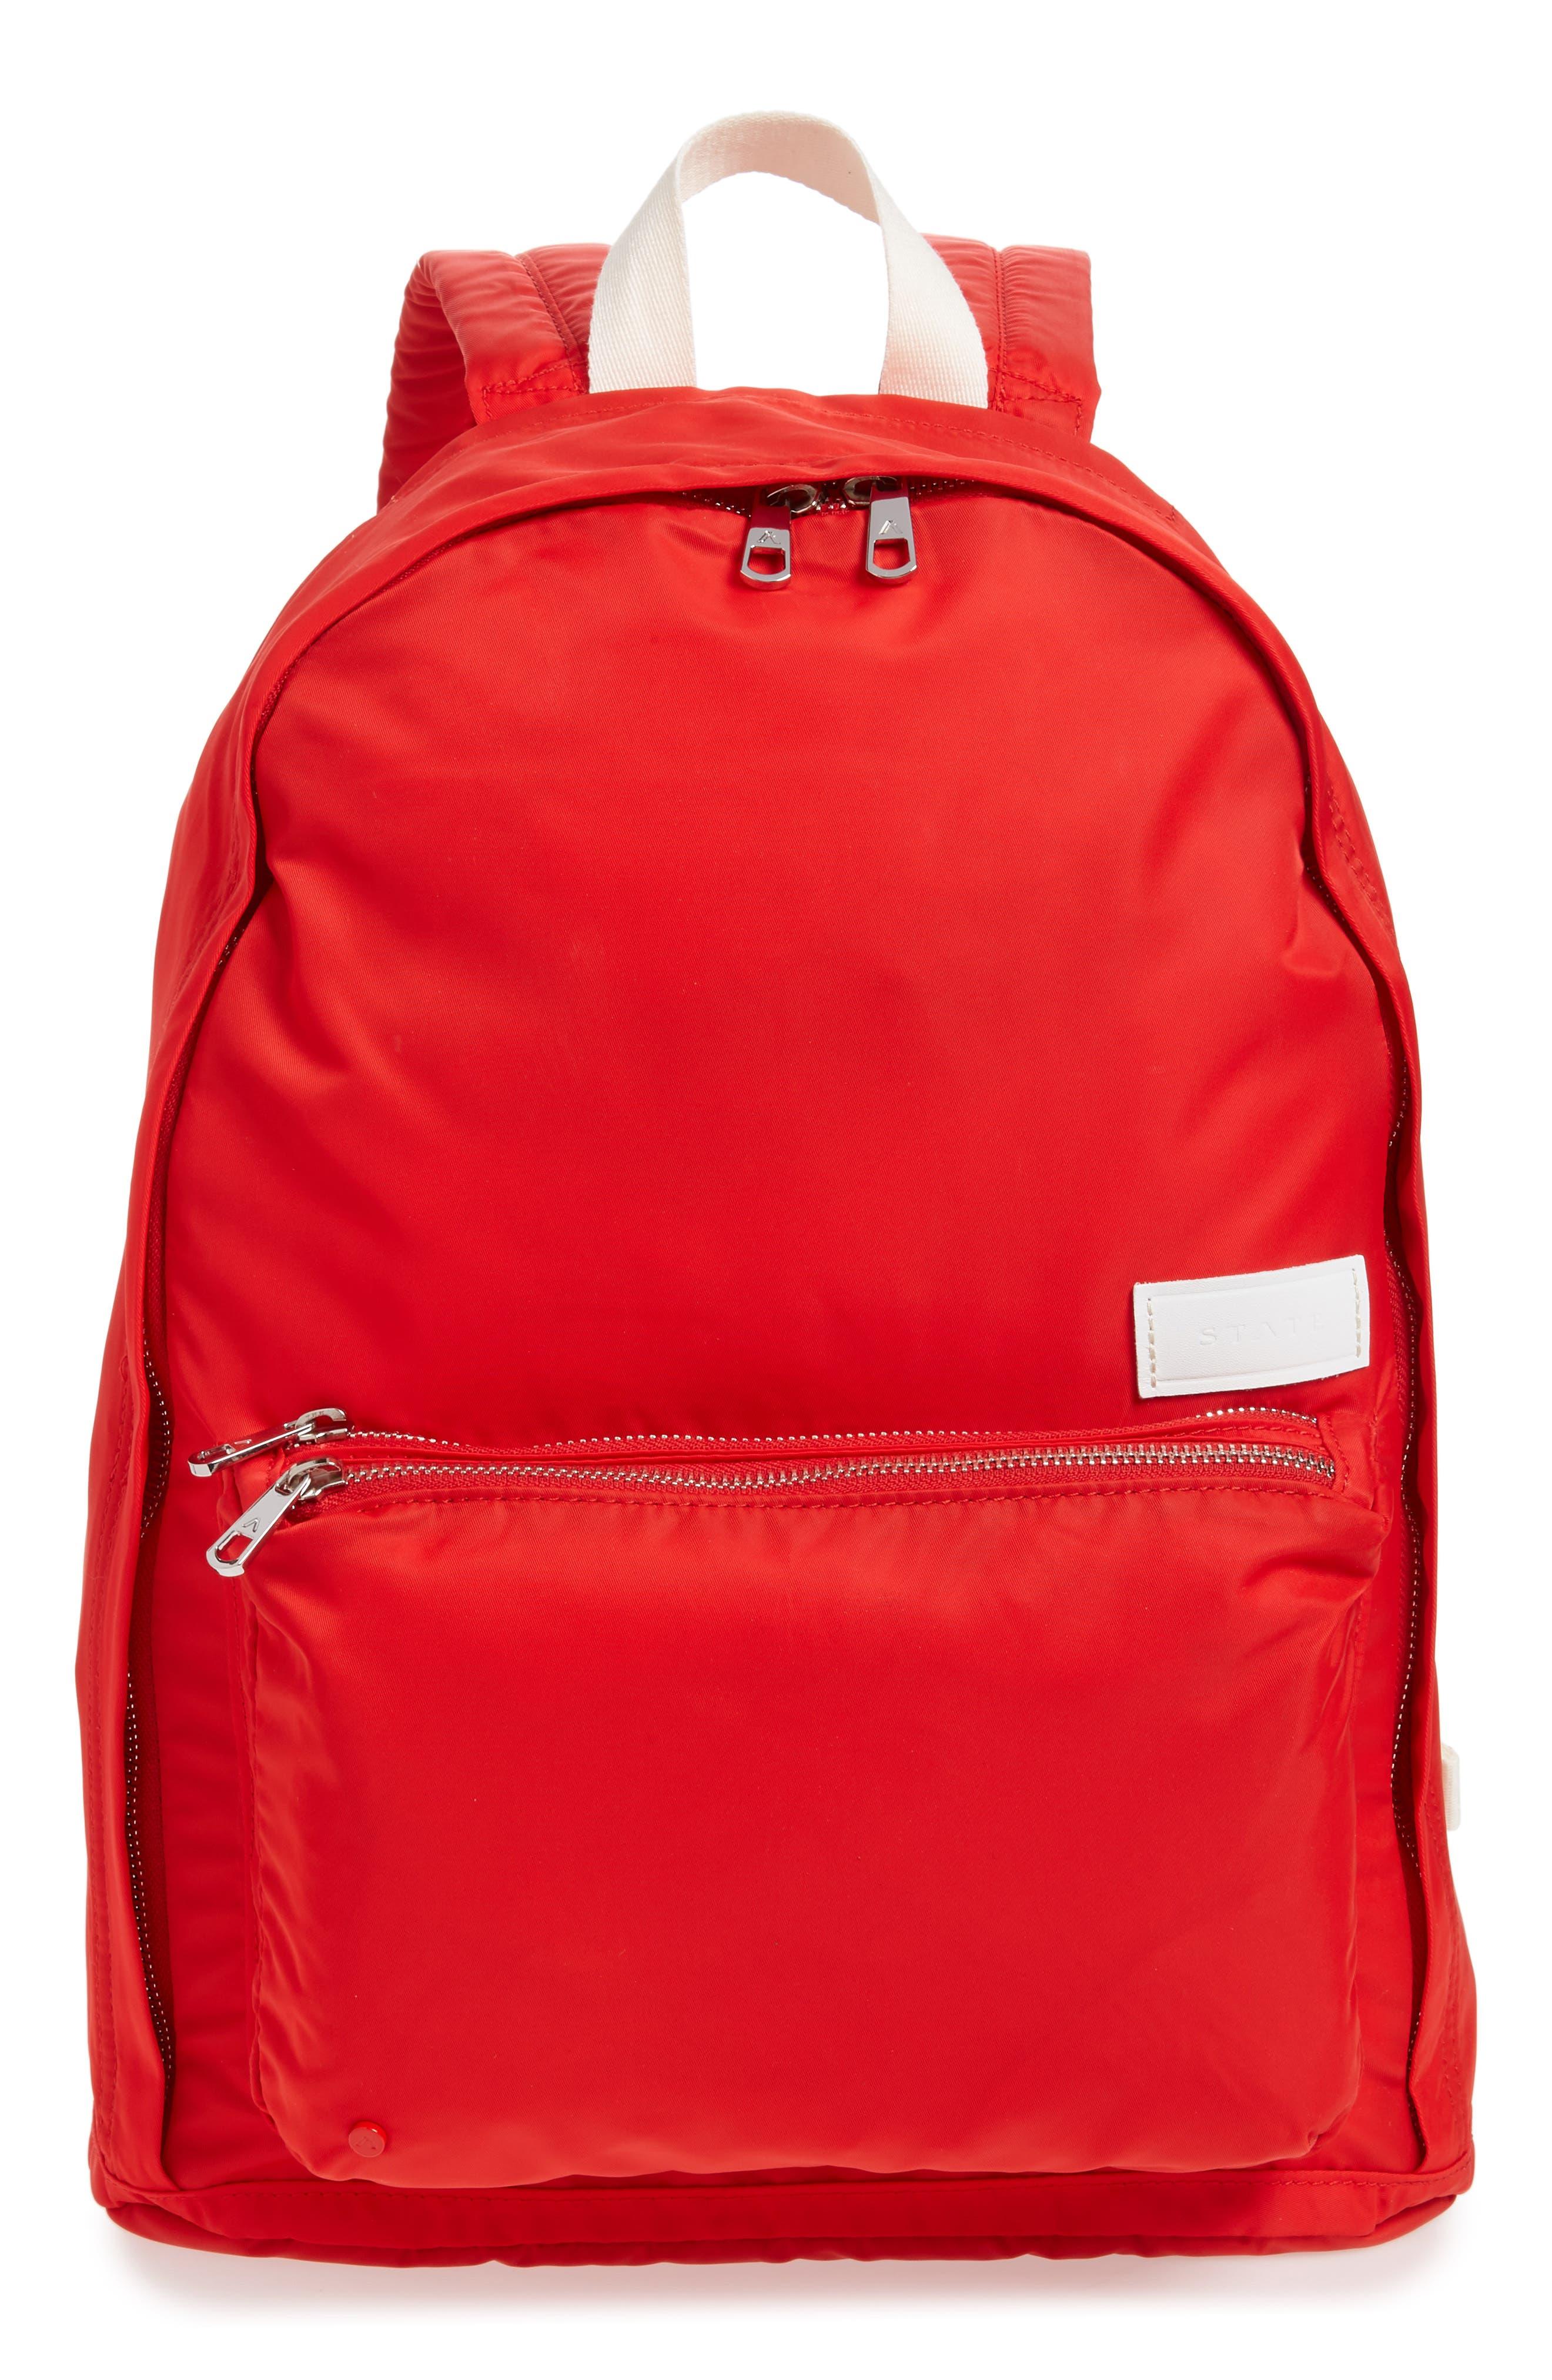 Heights Lorimer Nylon Backpack,                             Main thumbnail 1, color,                             RED